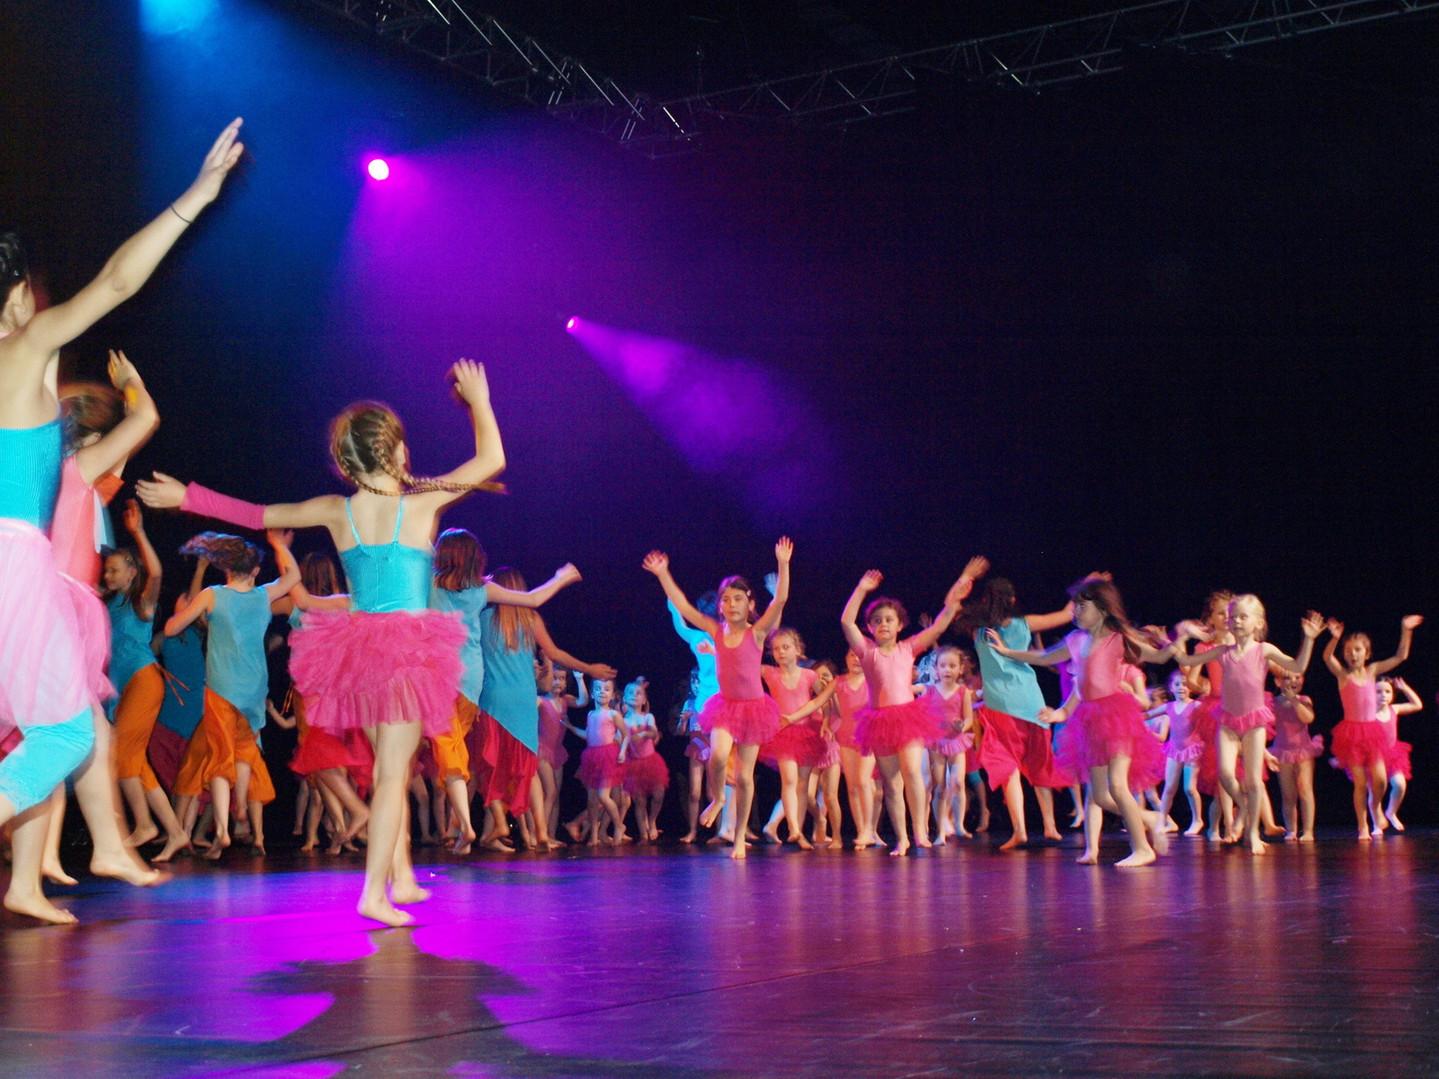 ob_7b5689_2016-06-18-andre-danse-scarabe